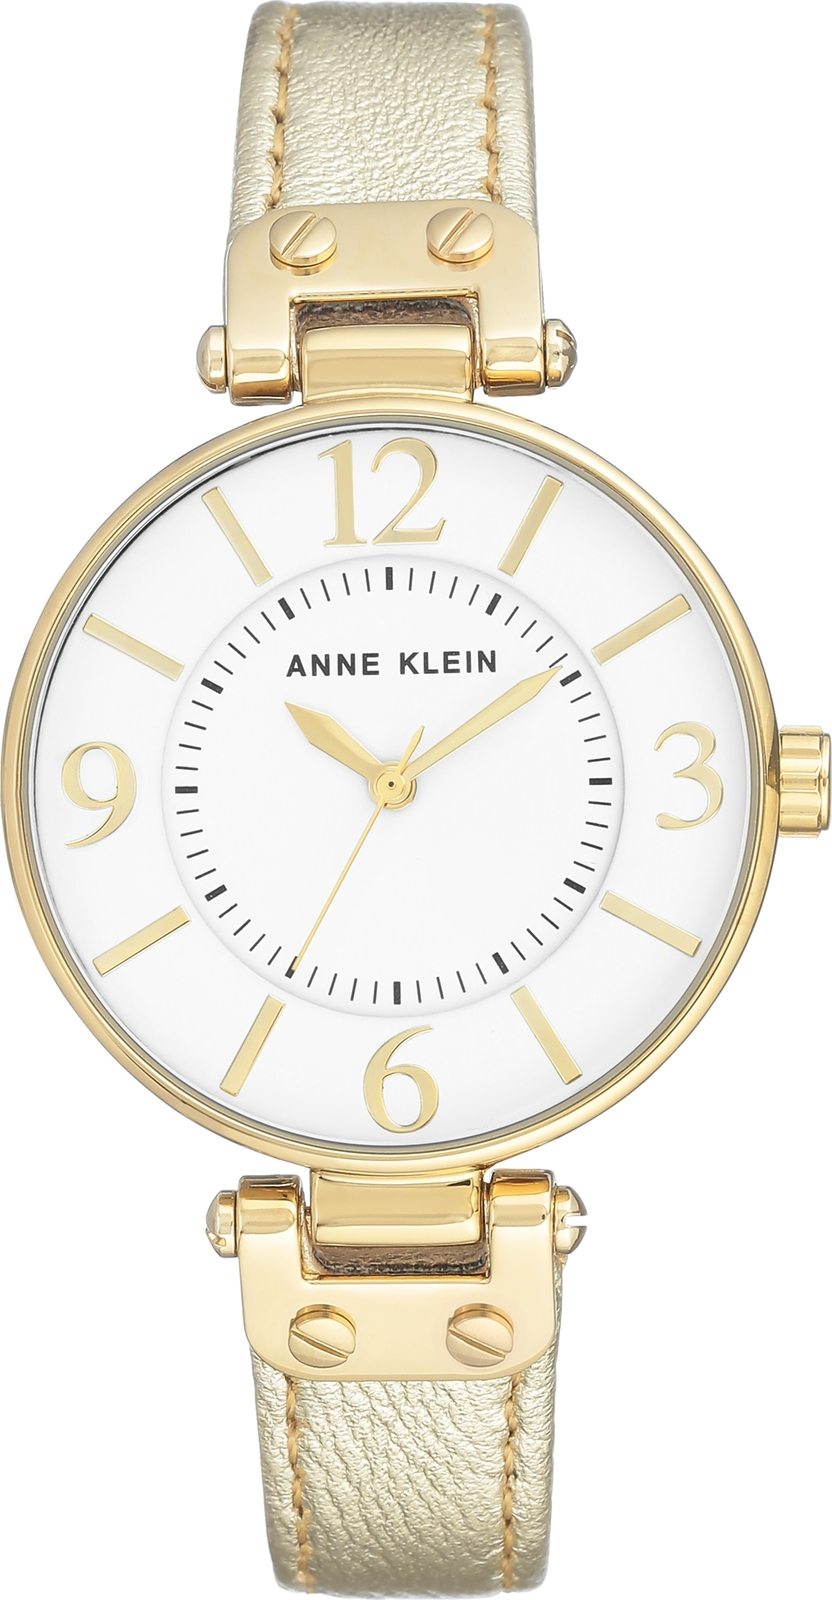 Наручные часы Anne Klein женские золотой все цены